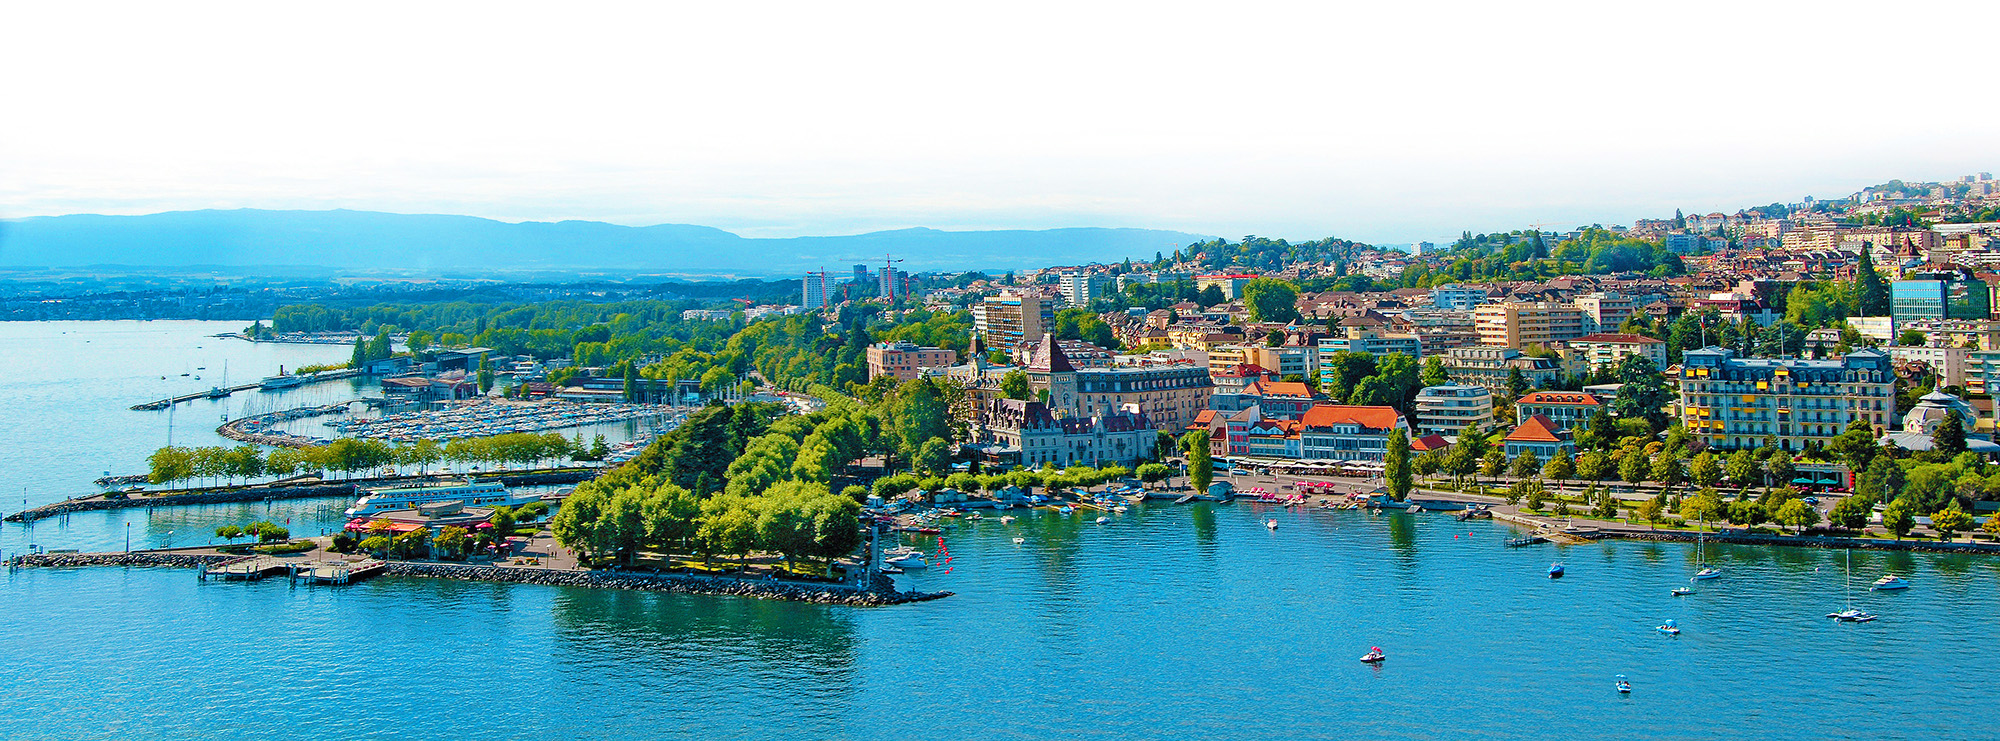 kt_2020_300_Keytours_excursions_Swisstours_lausanne_city3_2000_10